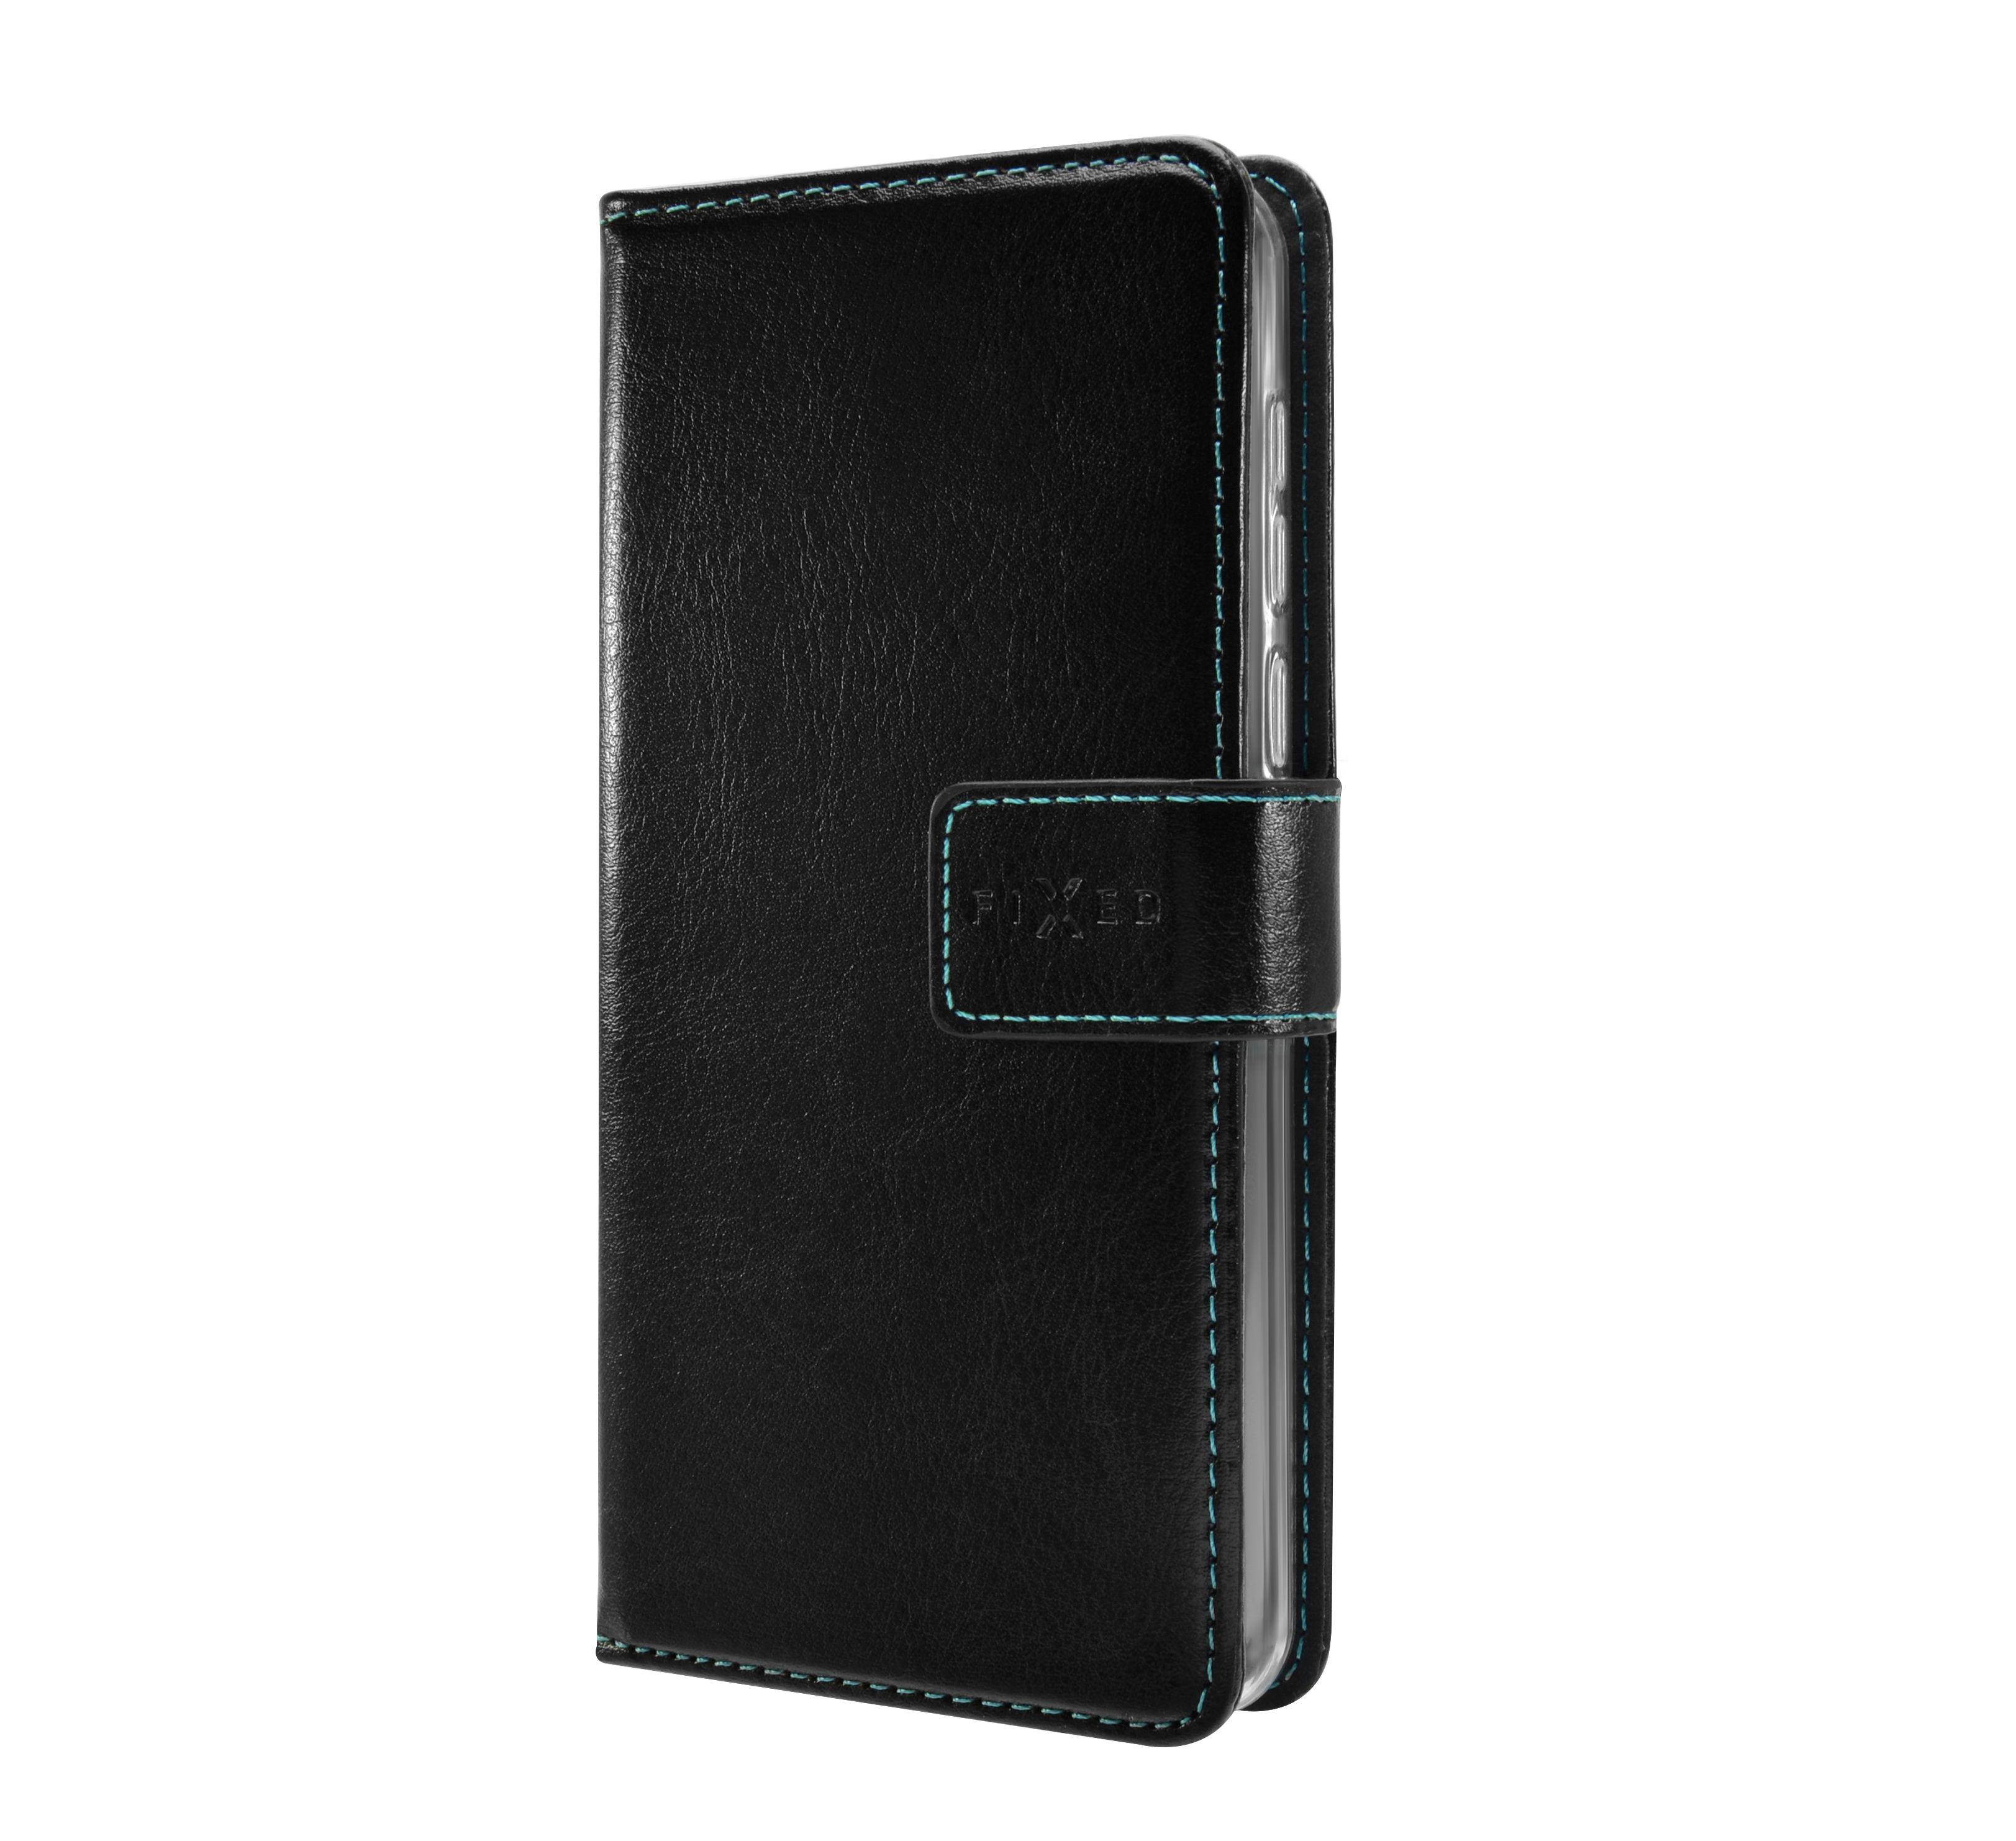 Pouzdro typu kniha FIXED Opus pro Sony Xperia XZ2, černé